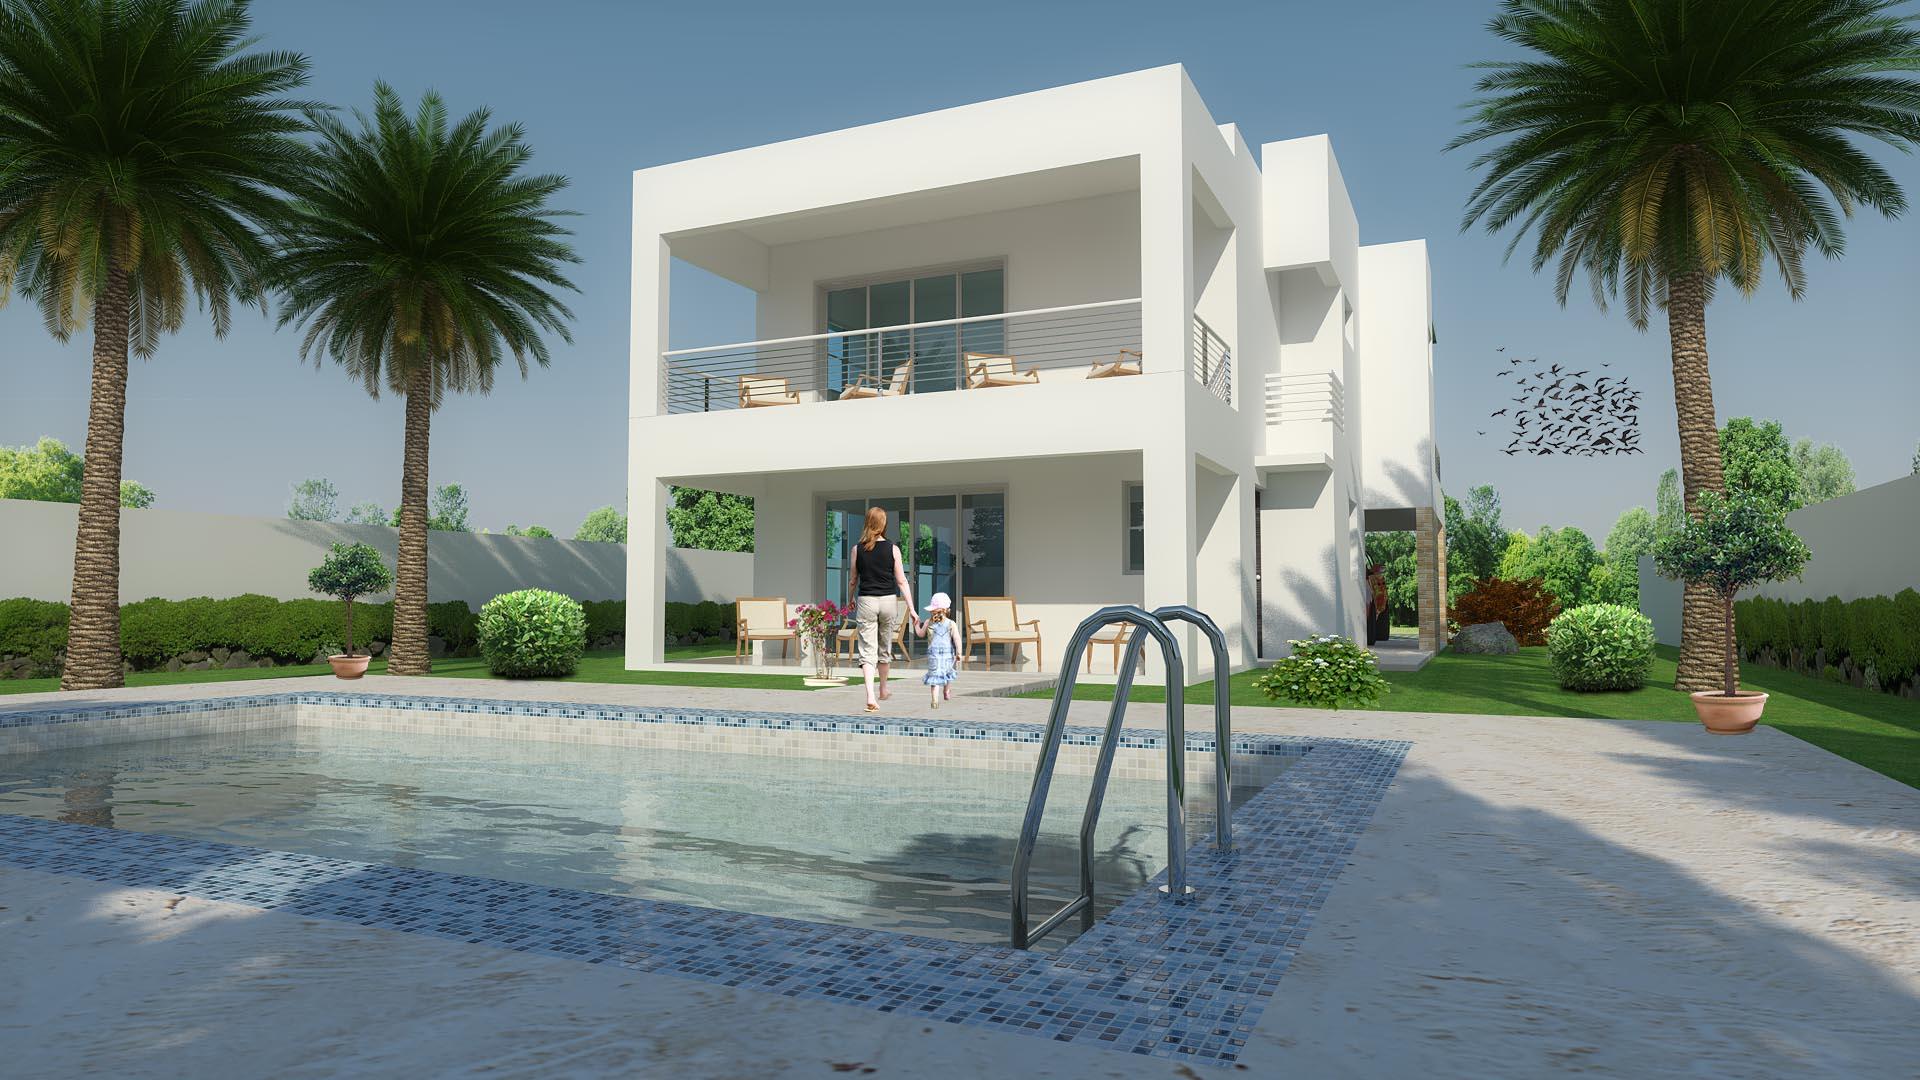 2 bedrooms villa Onix for sale – Sosua, Puerto Plata